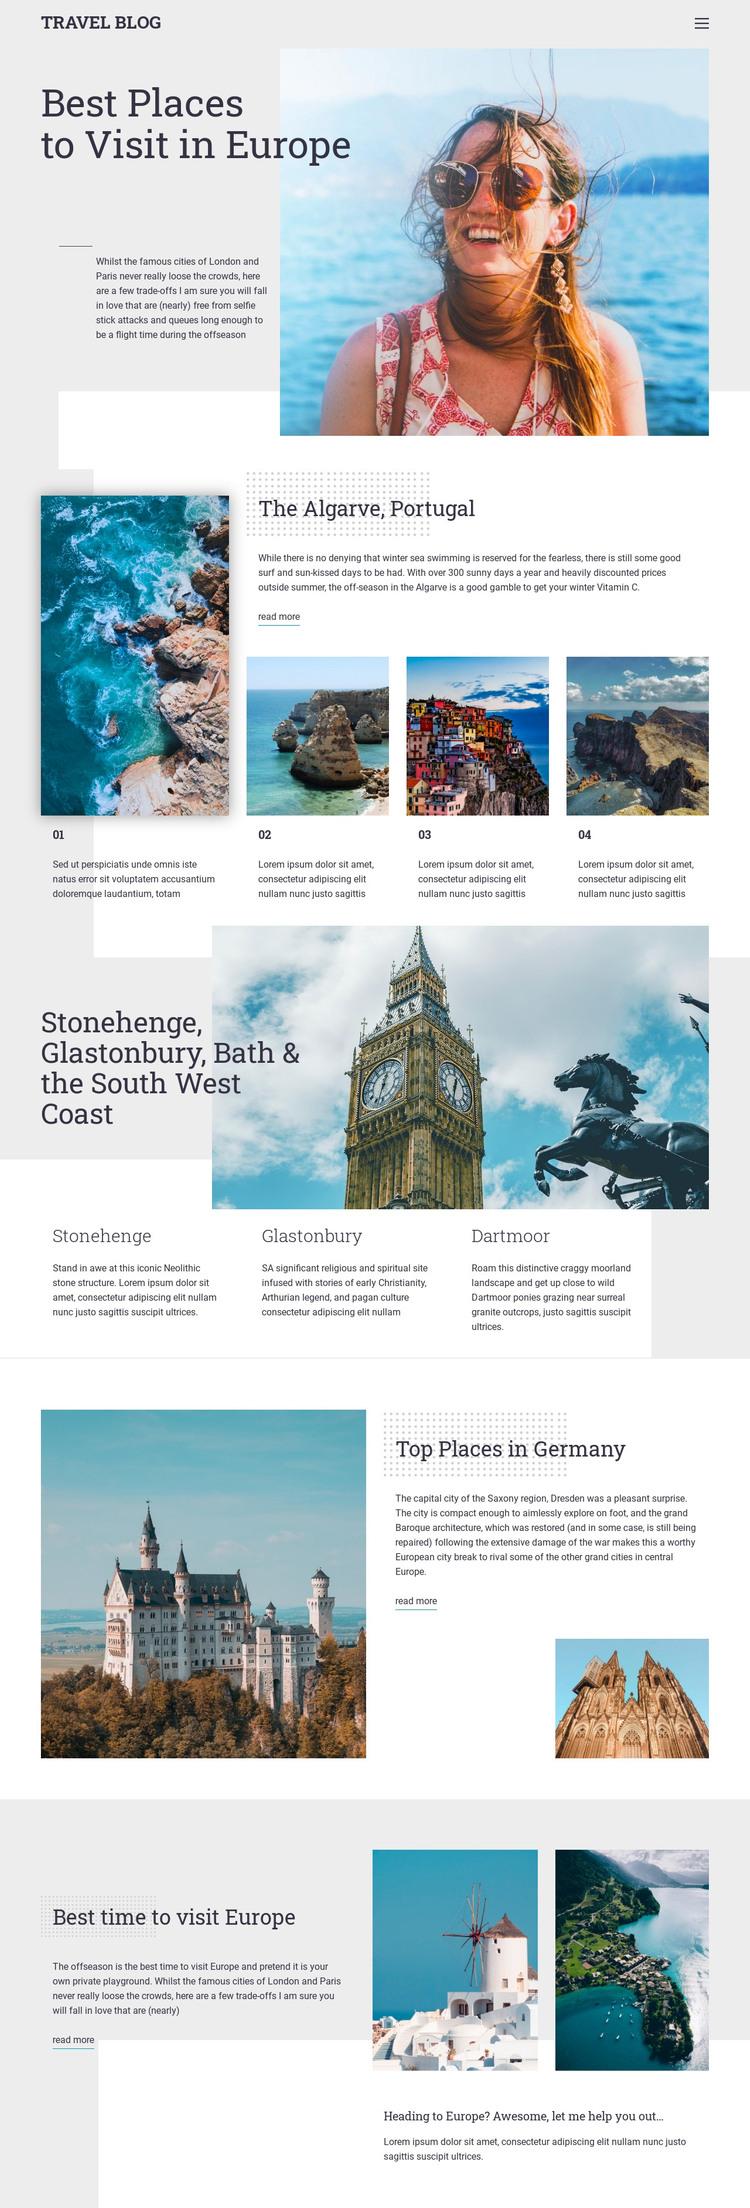 Travel Blog Homepage Design